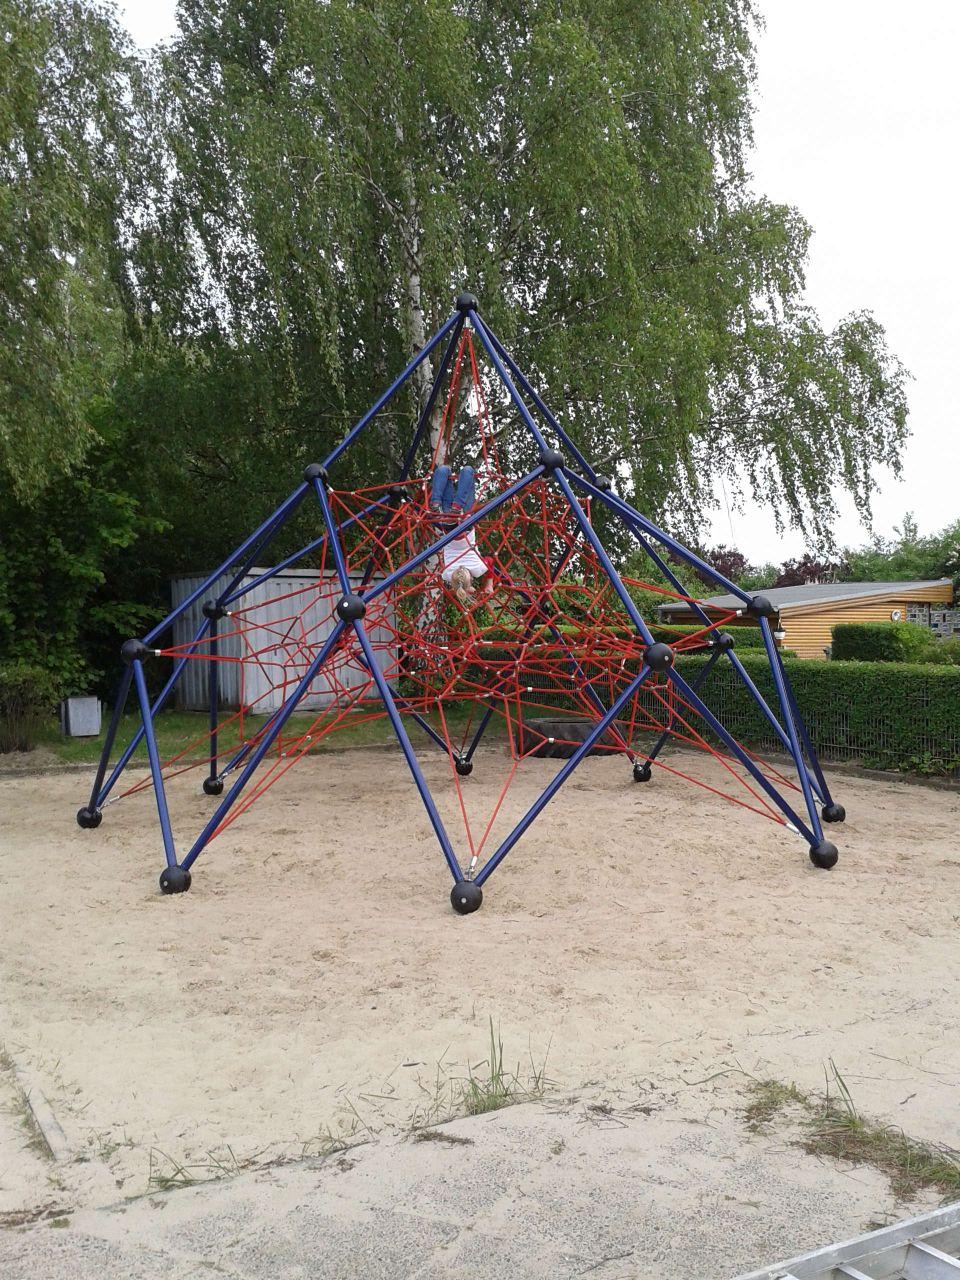 Spinne6l